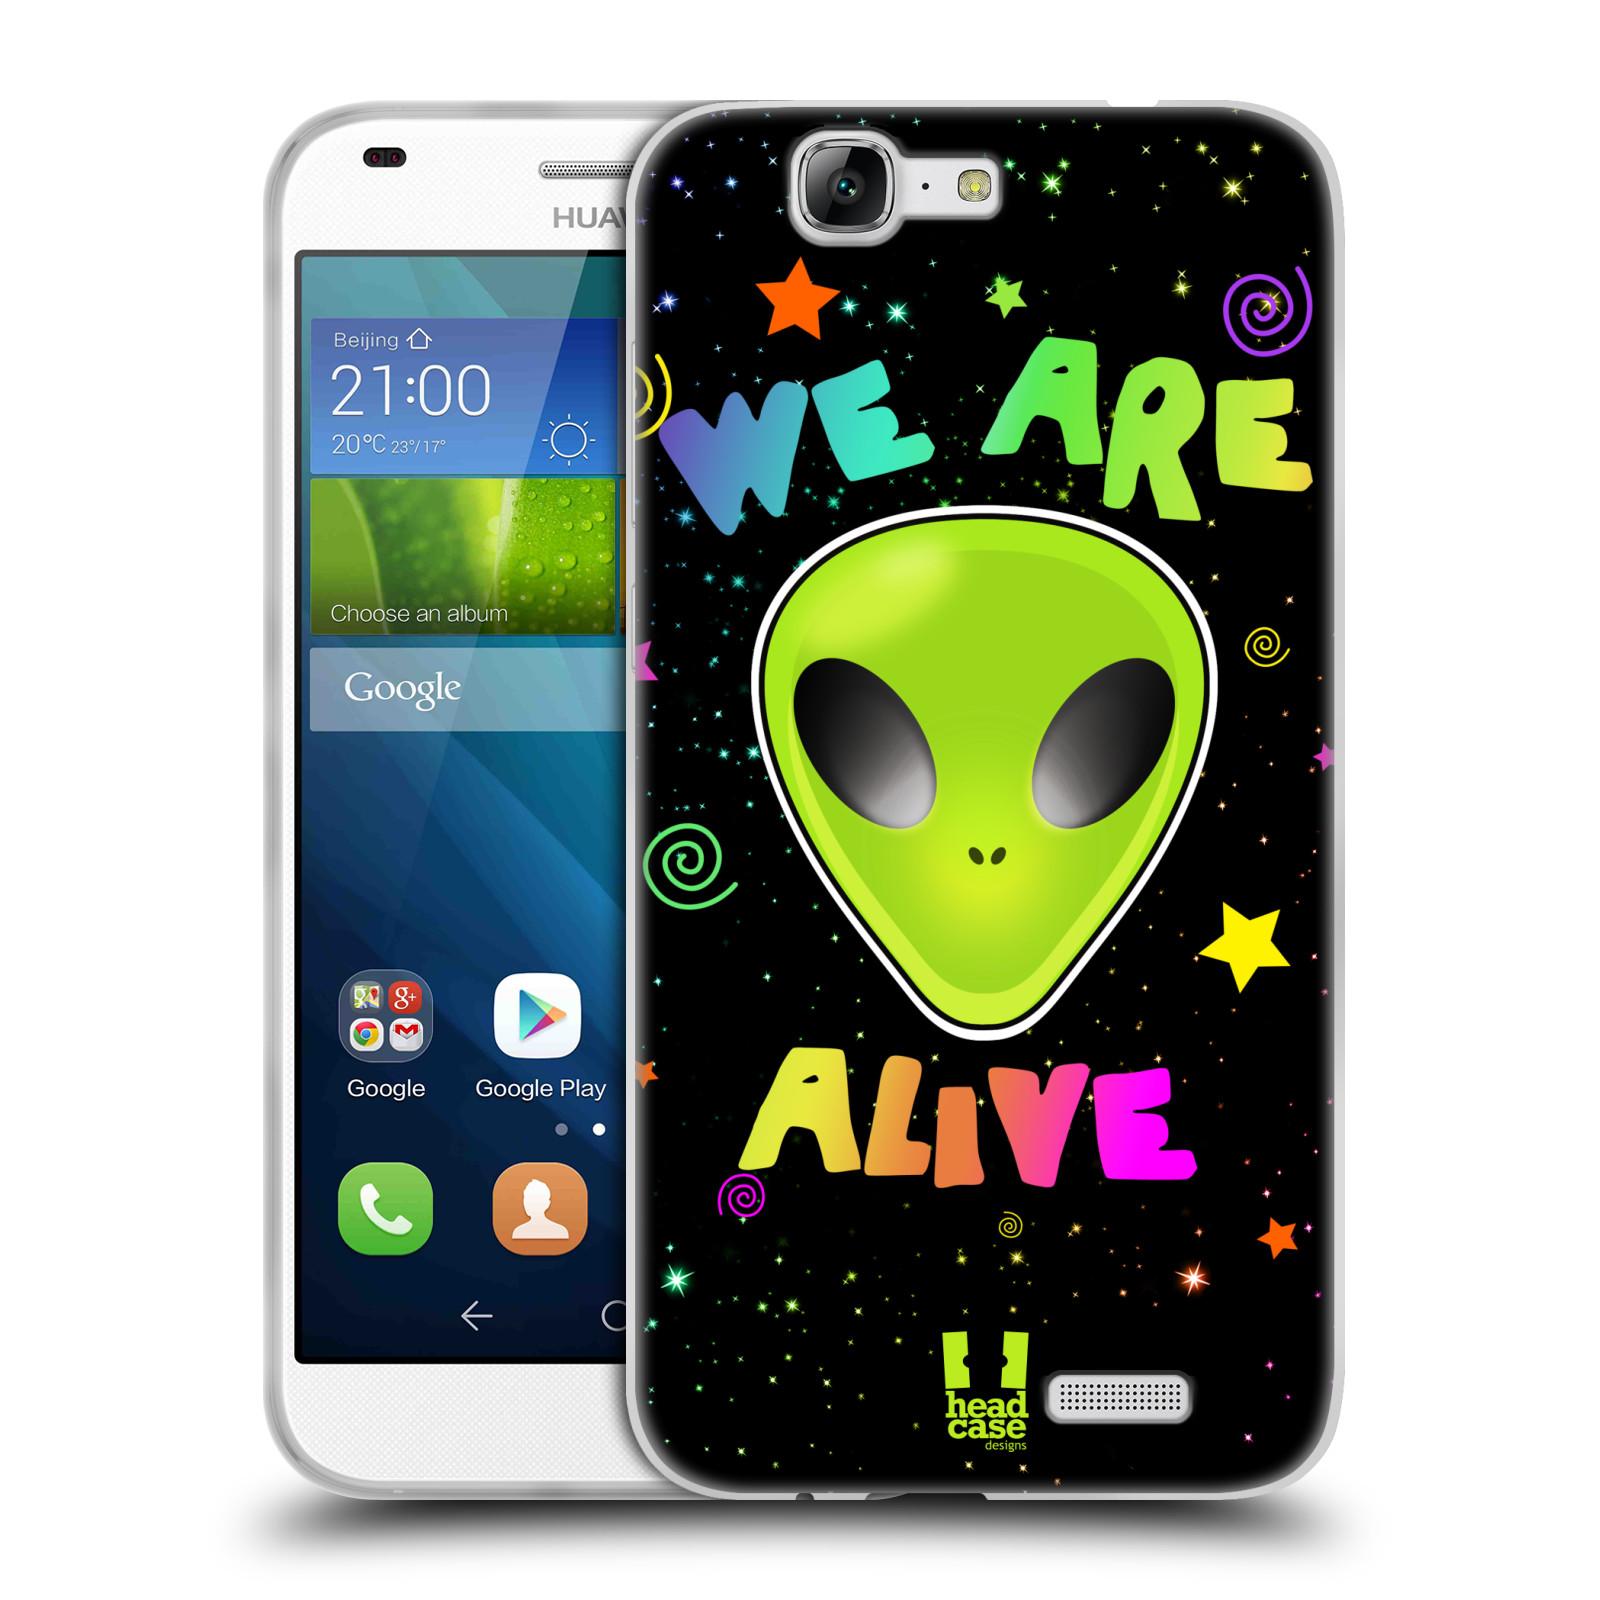 Silikonové pouzdro na mobil Huawei Ascend G7 HEAD CASE ALIENS ALIVE